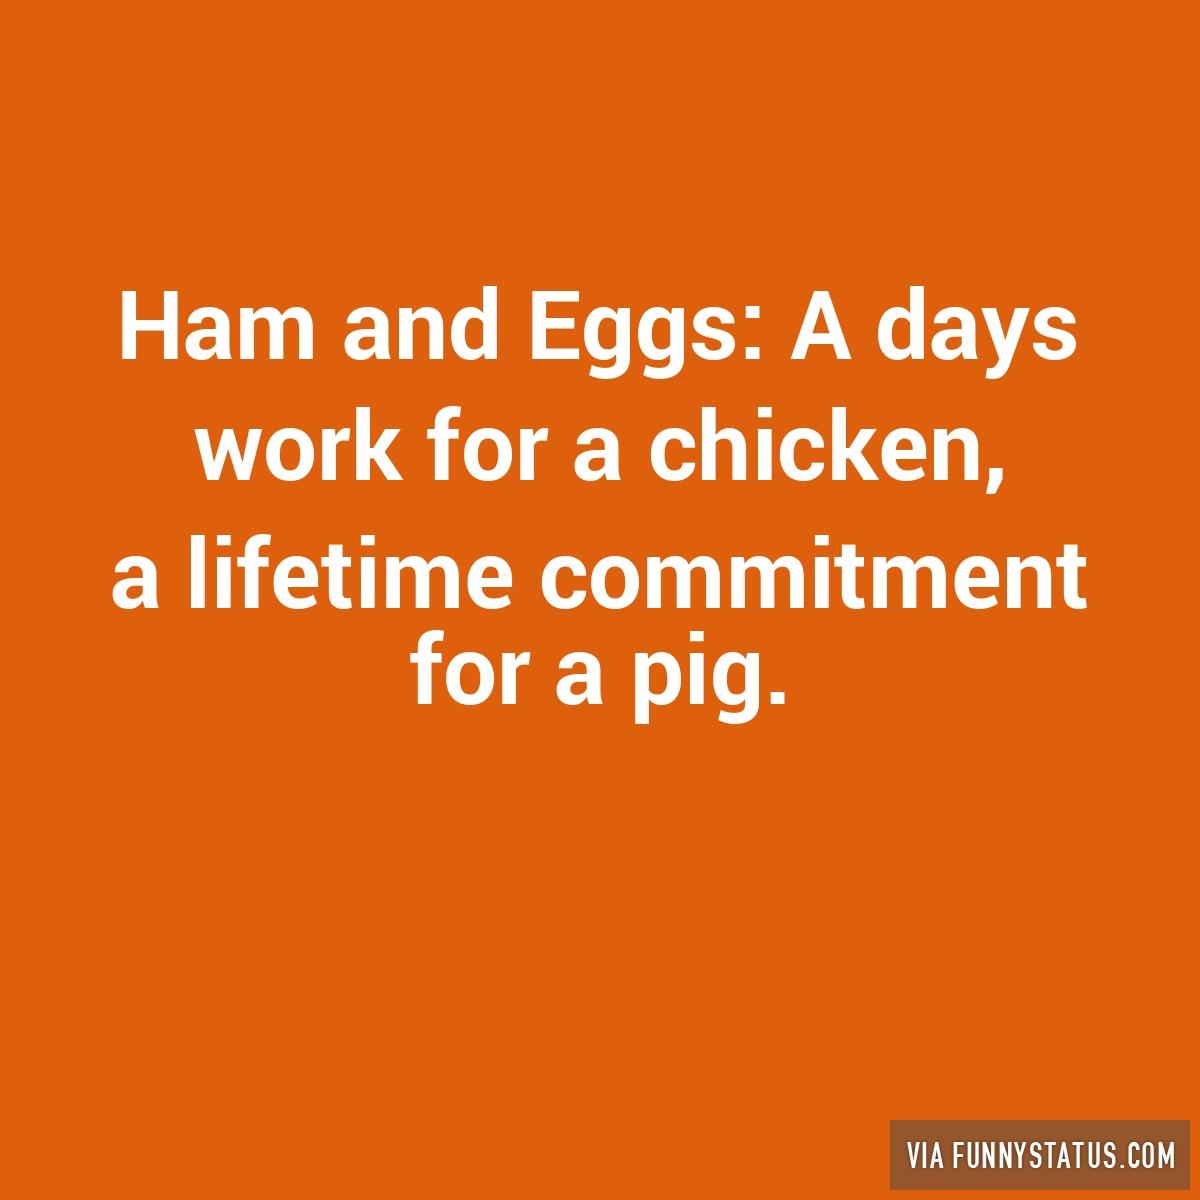 lifetime commitment